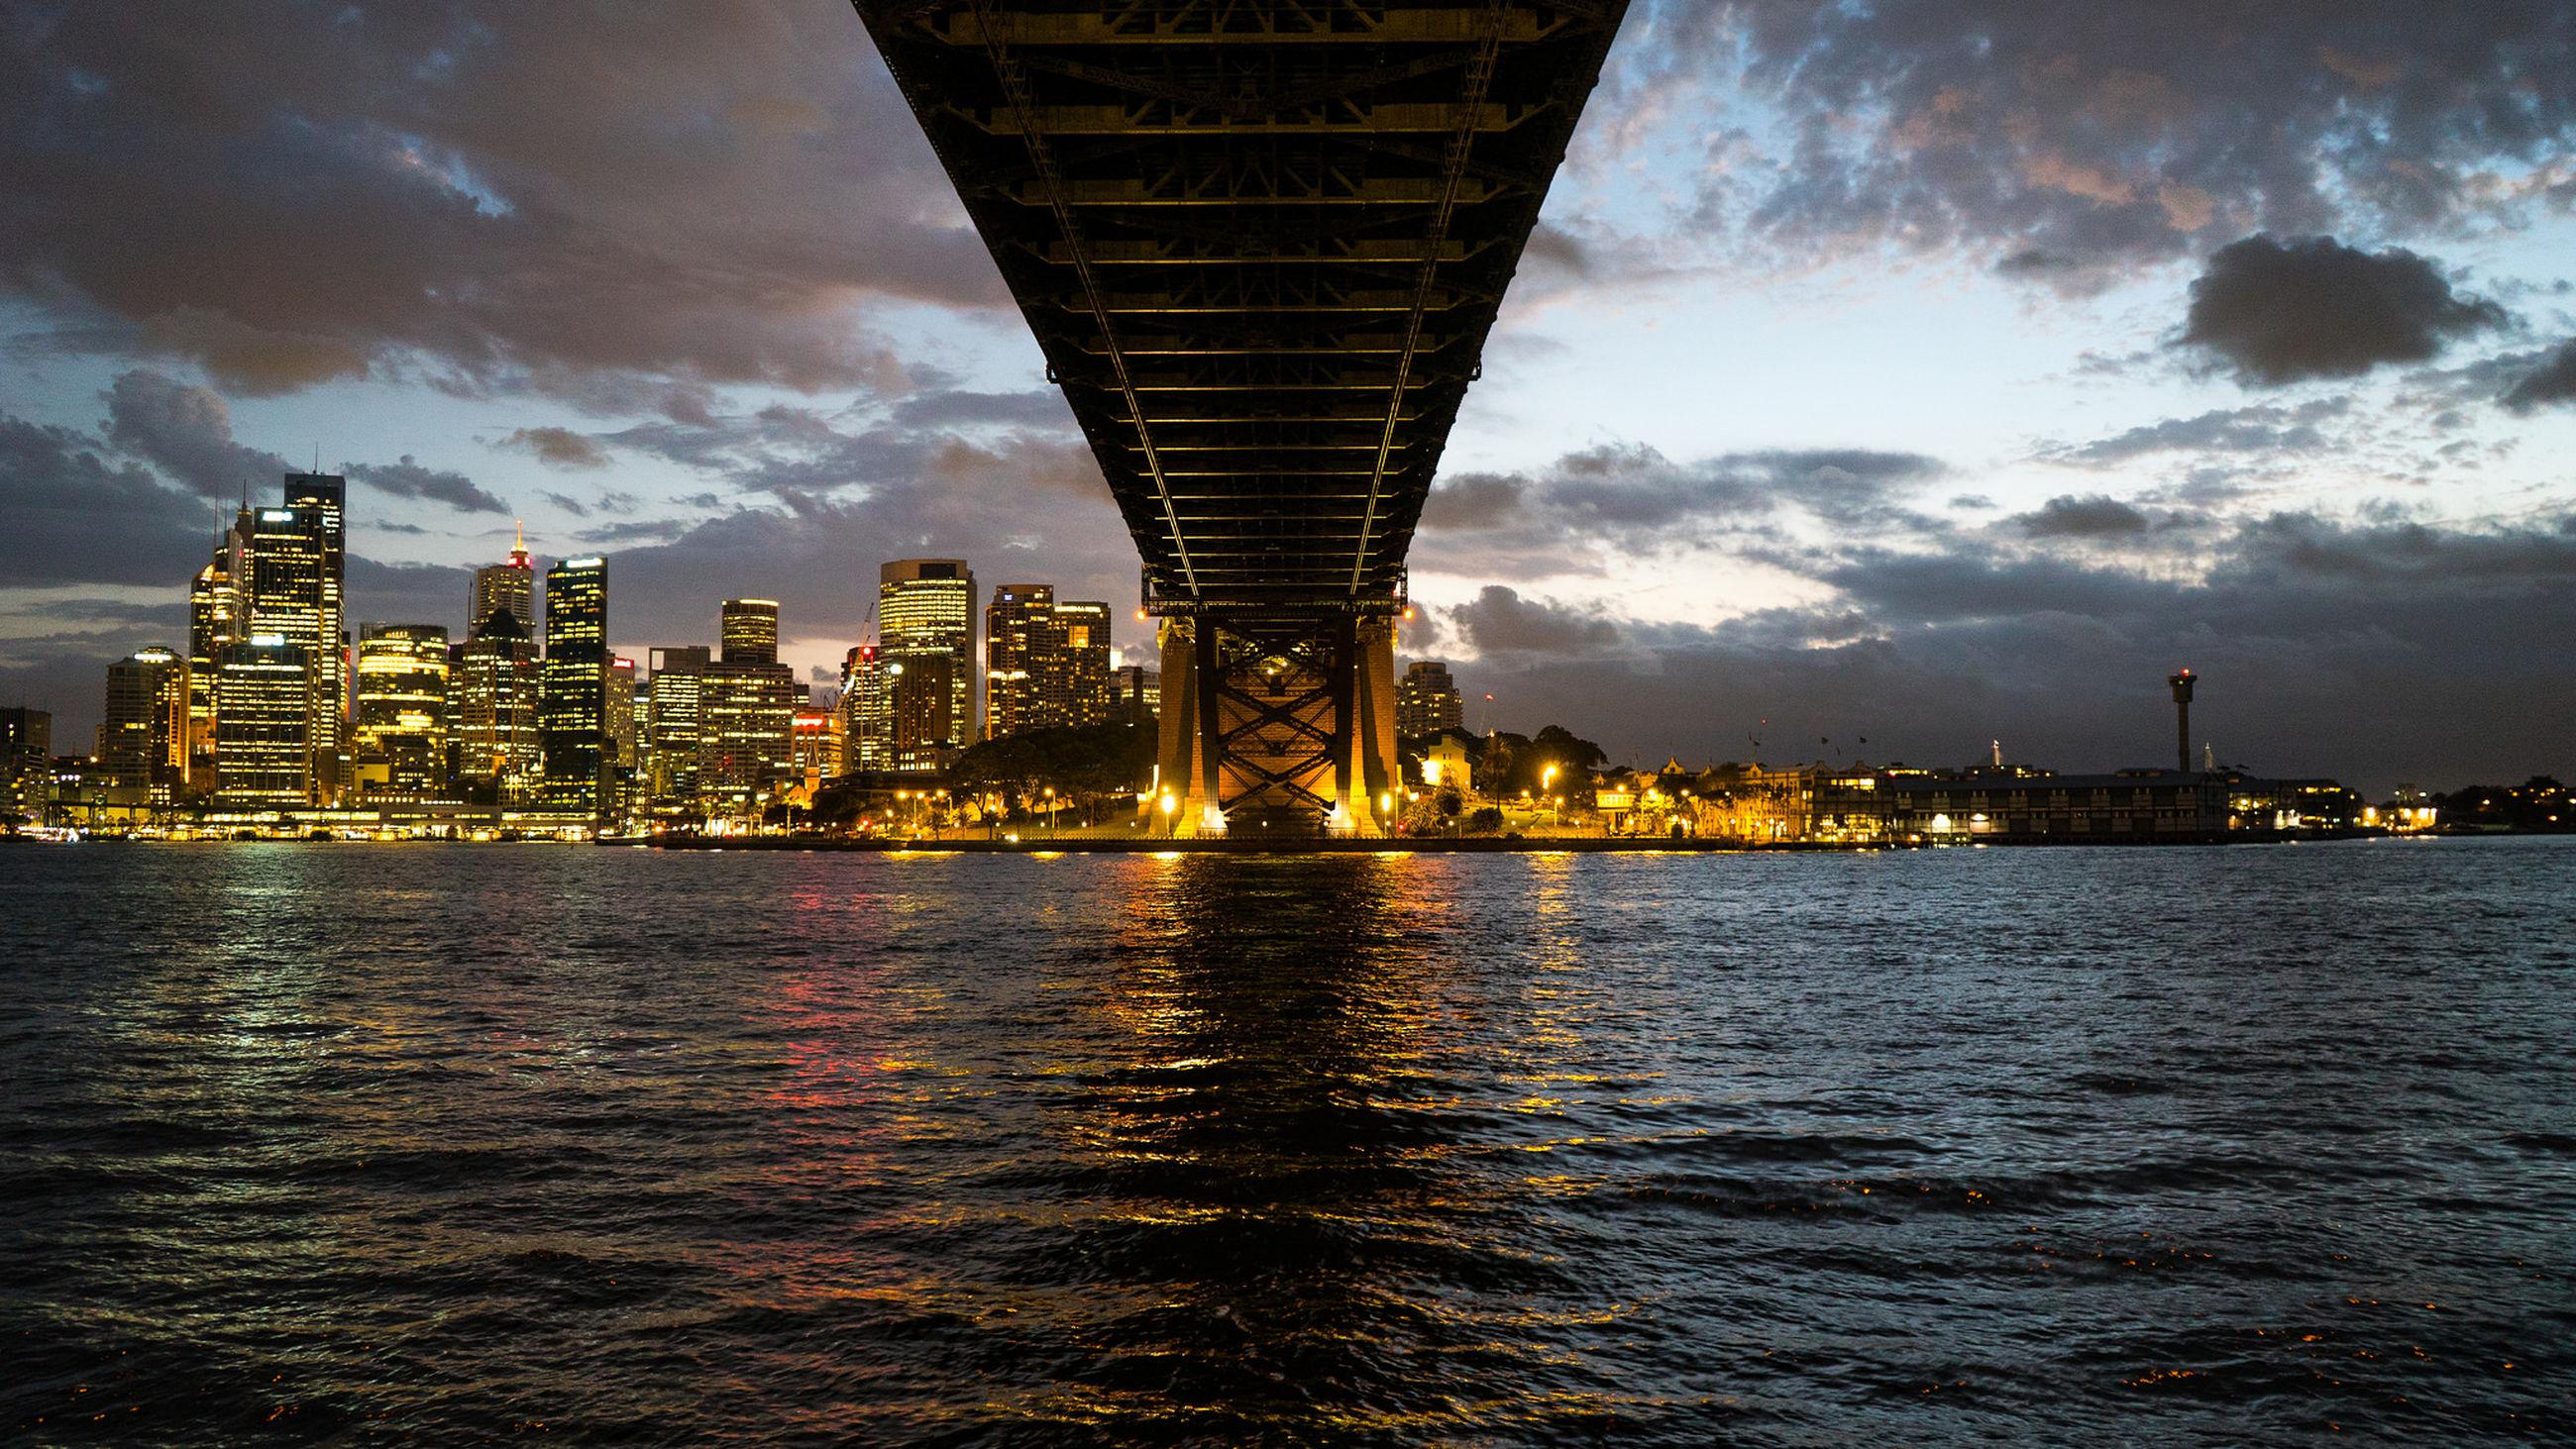 Bridge over river leading towards illuminated city against sky at sunset